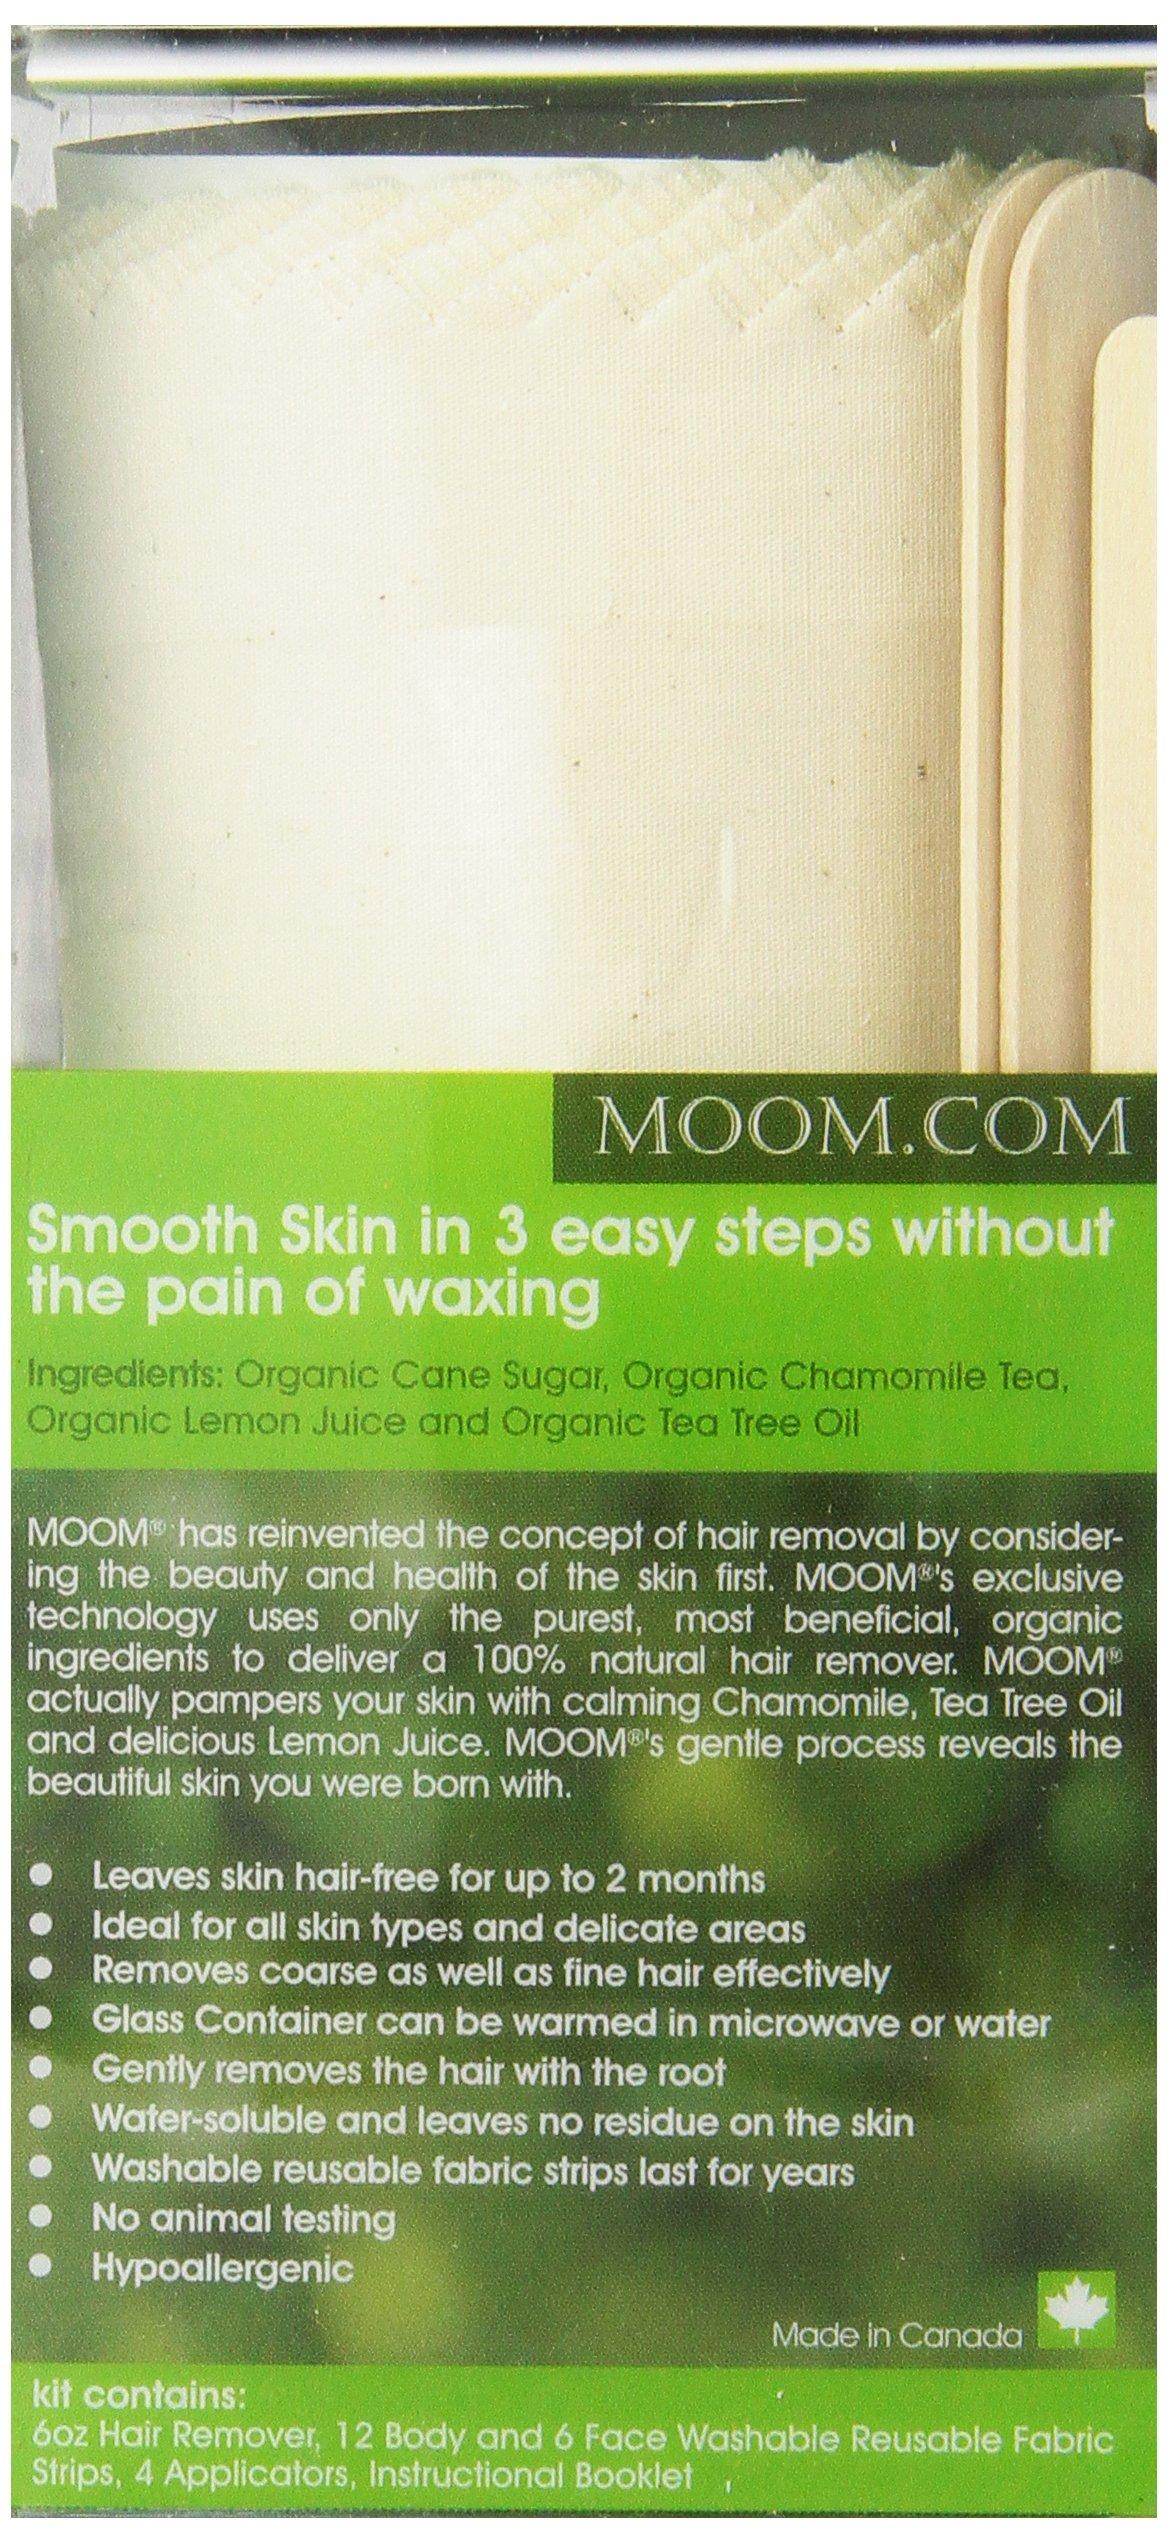 Moom Organic Hair Removal Kit, Tea Tree, 6-Ounce Package by Moom (Image #3)